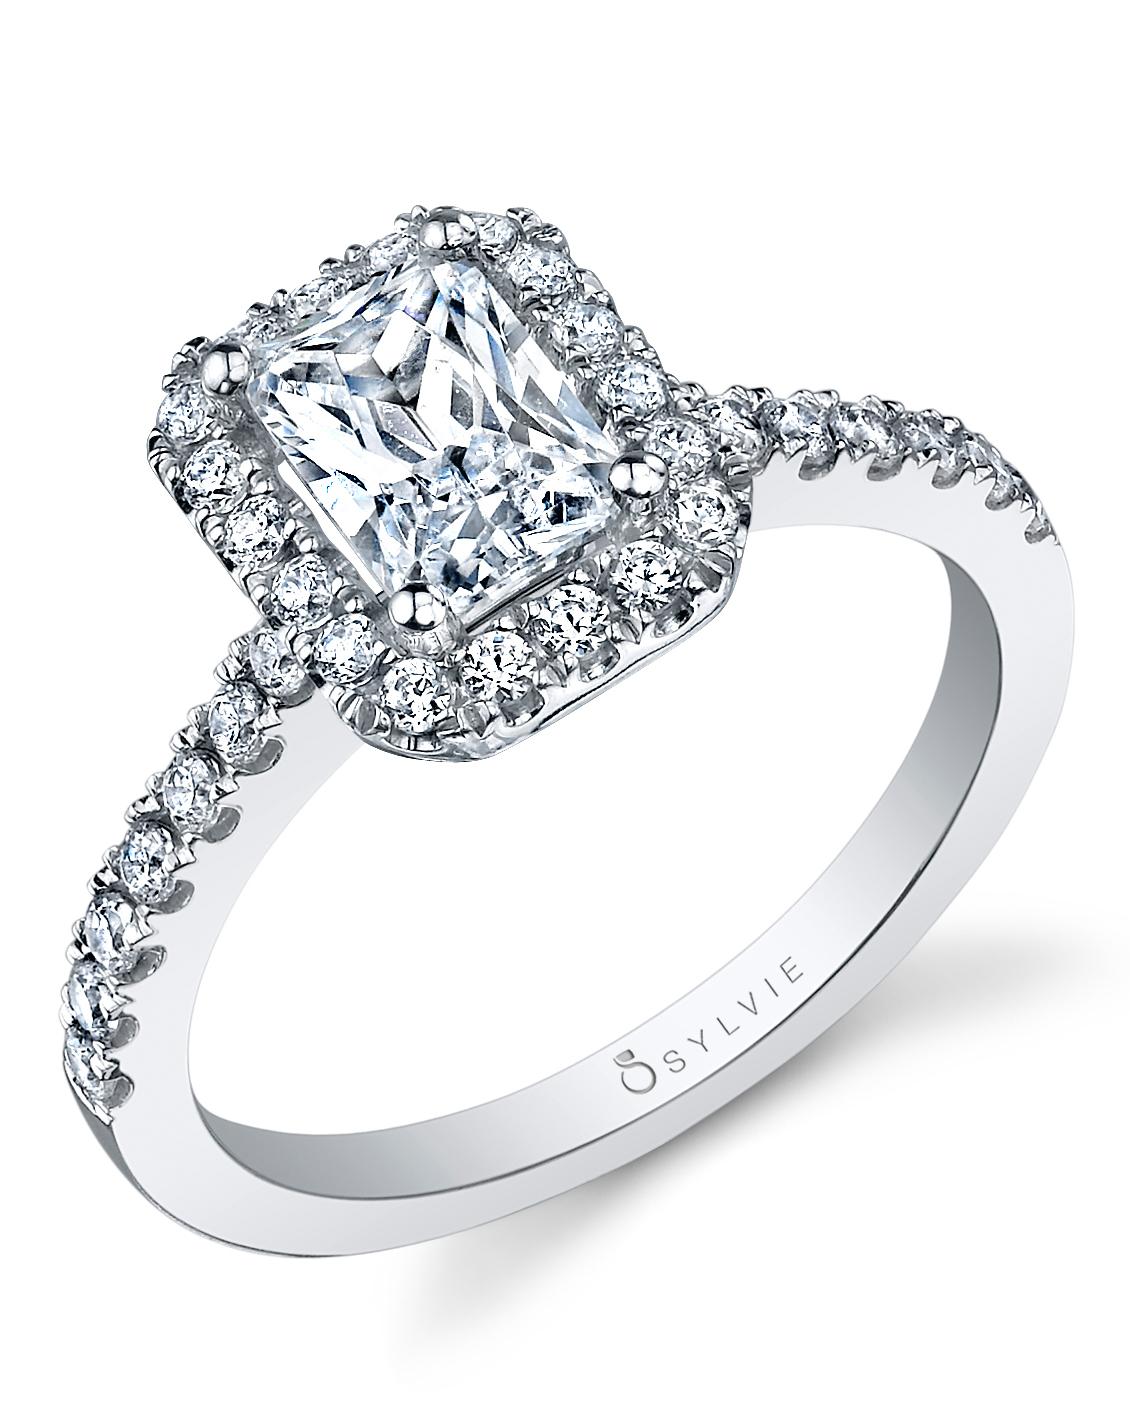 sylvie-emerald-cut-engagement-ring-two-0816.jpg